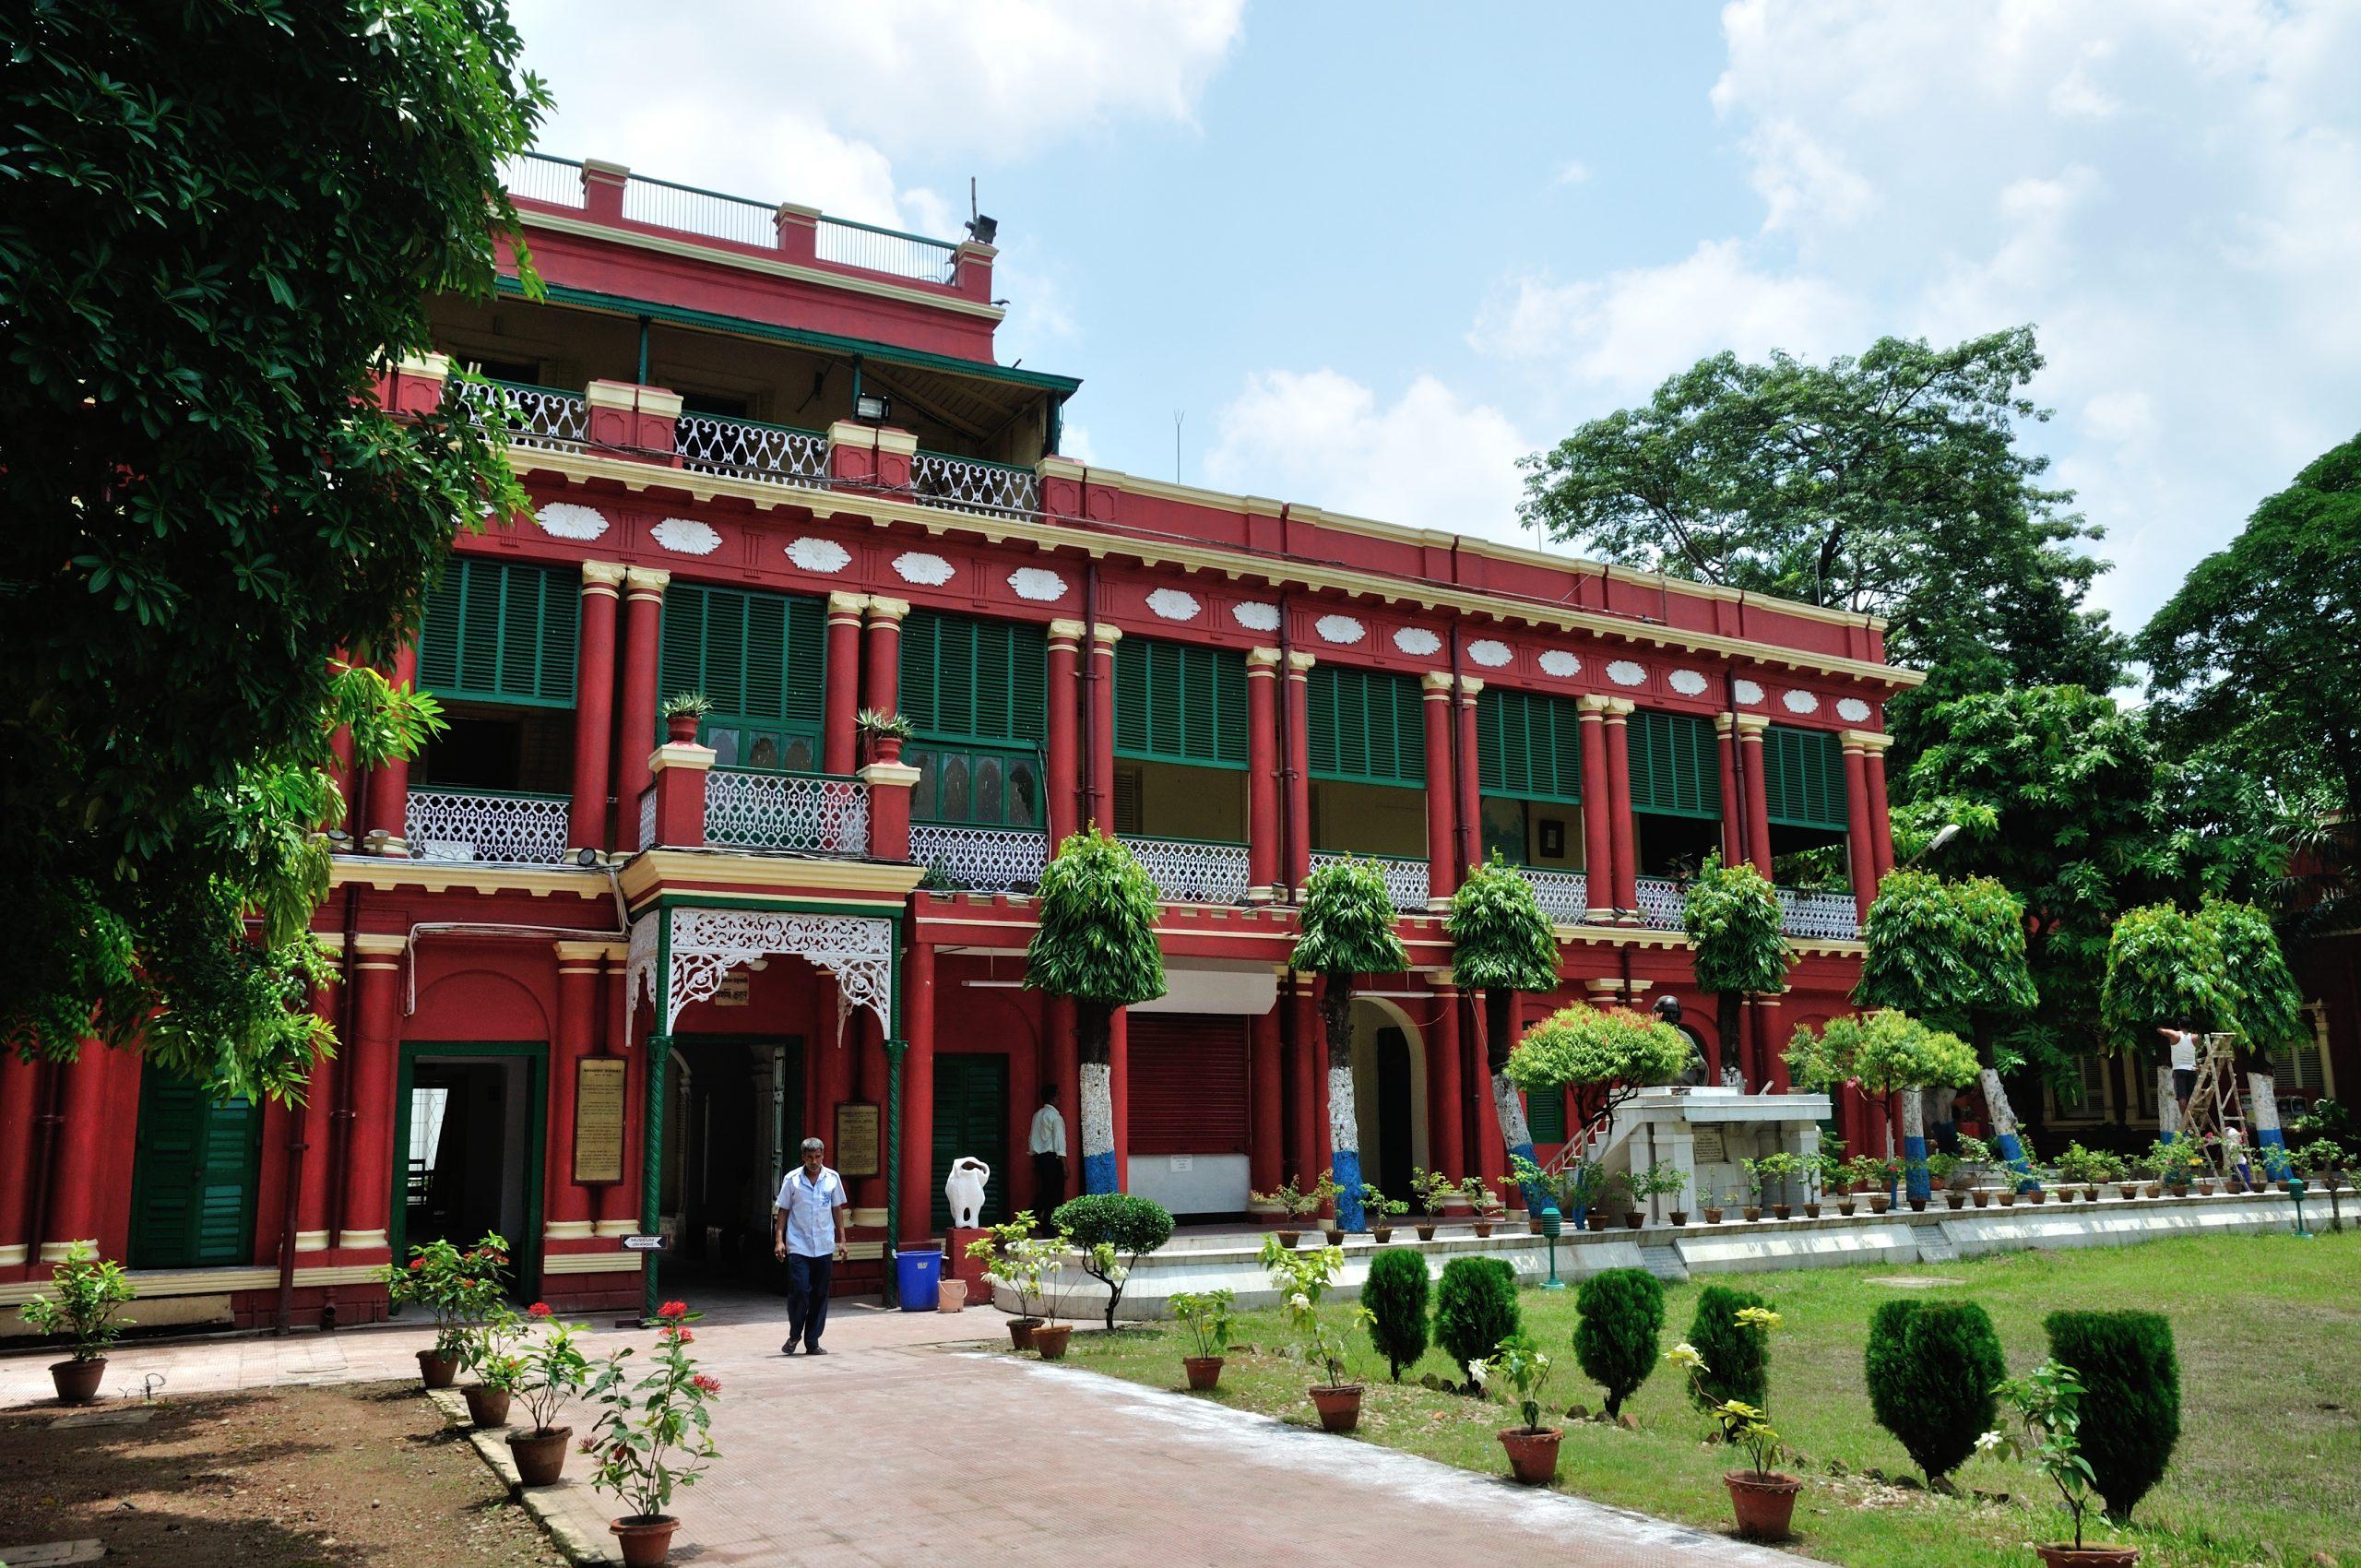 Jorasako Thakur Bari - Best Places In Kolkata For Every First-Time Traveler